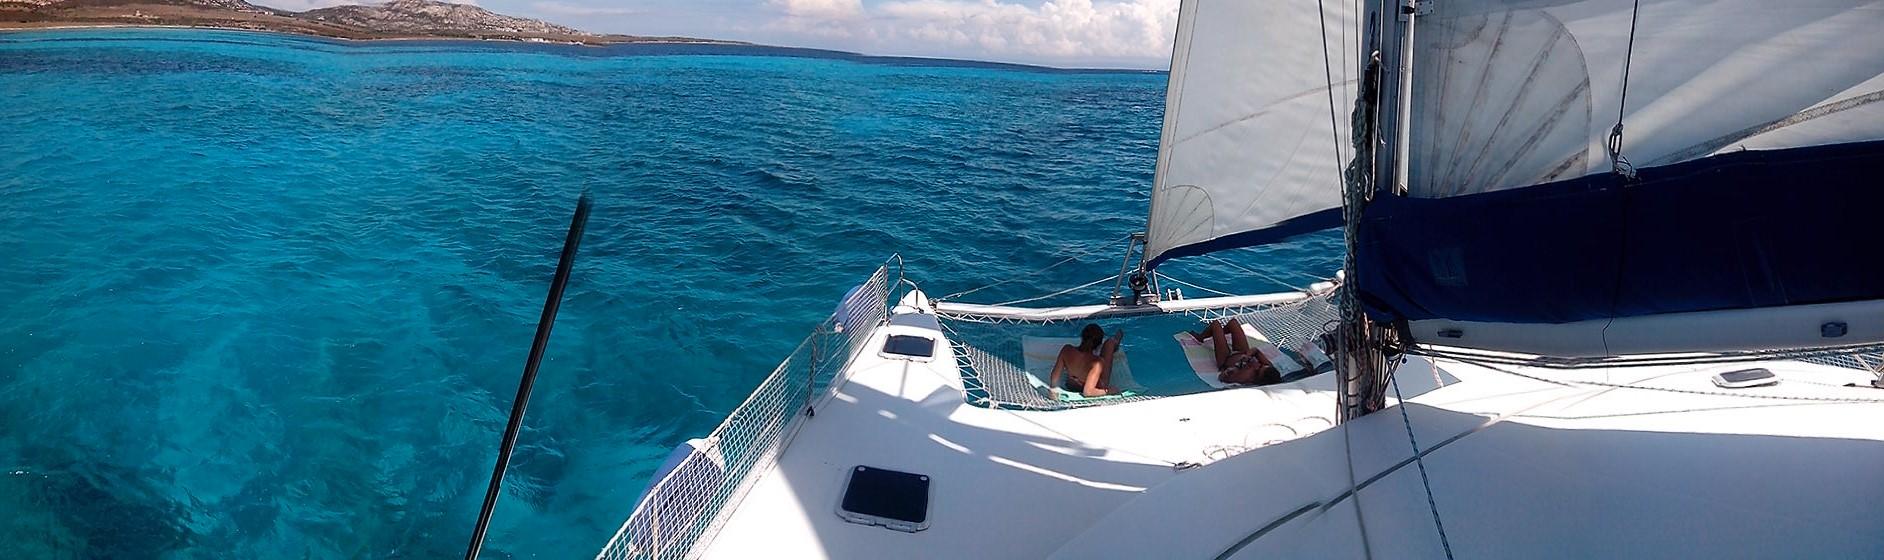 panoramica catamarano miguel asinara